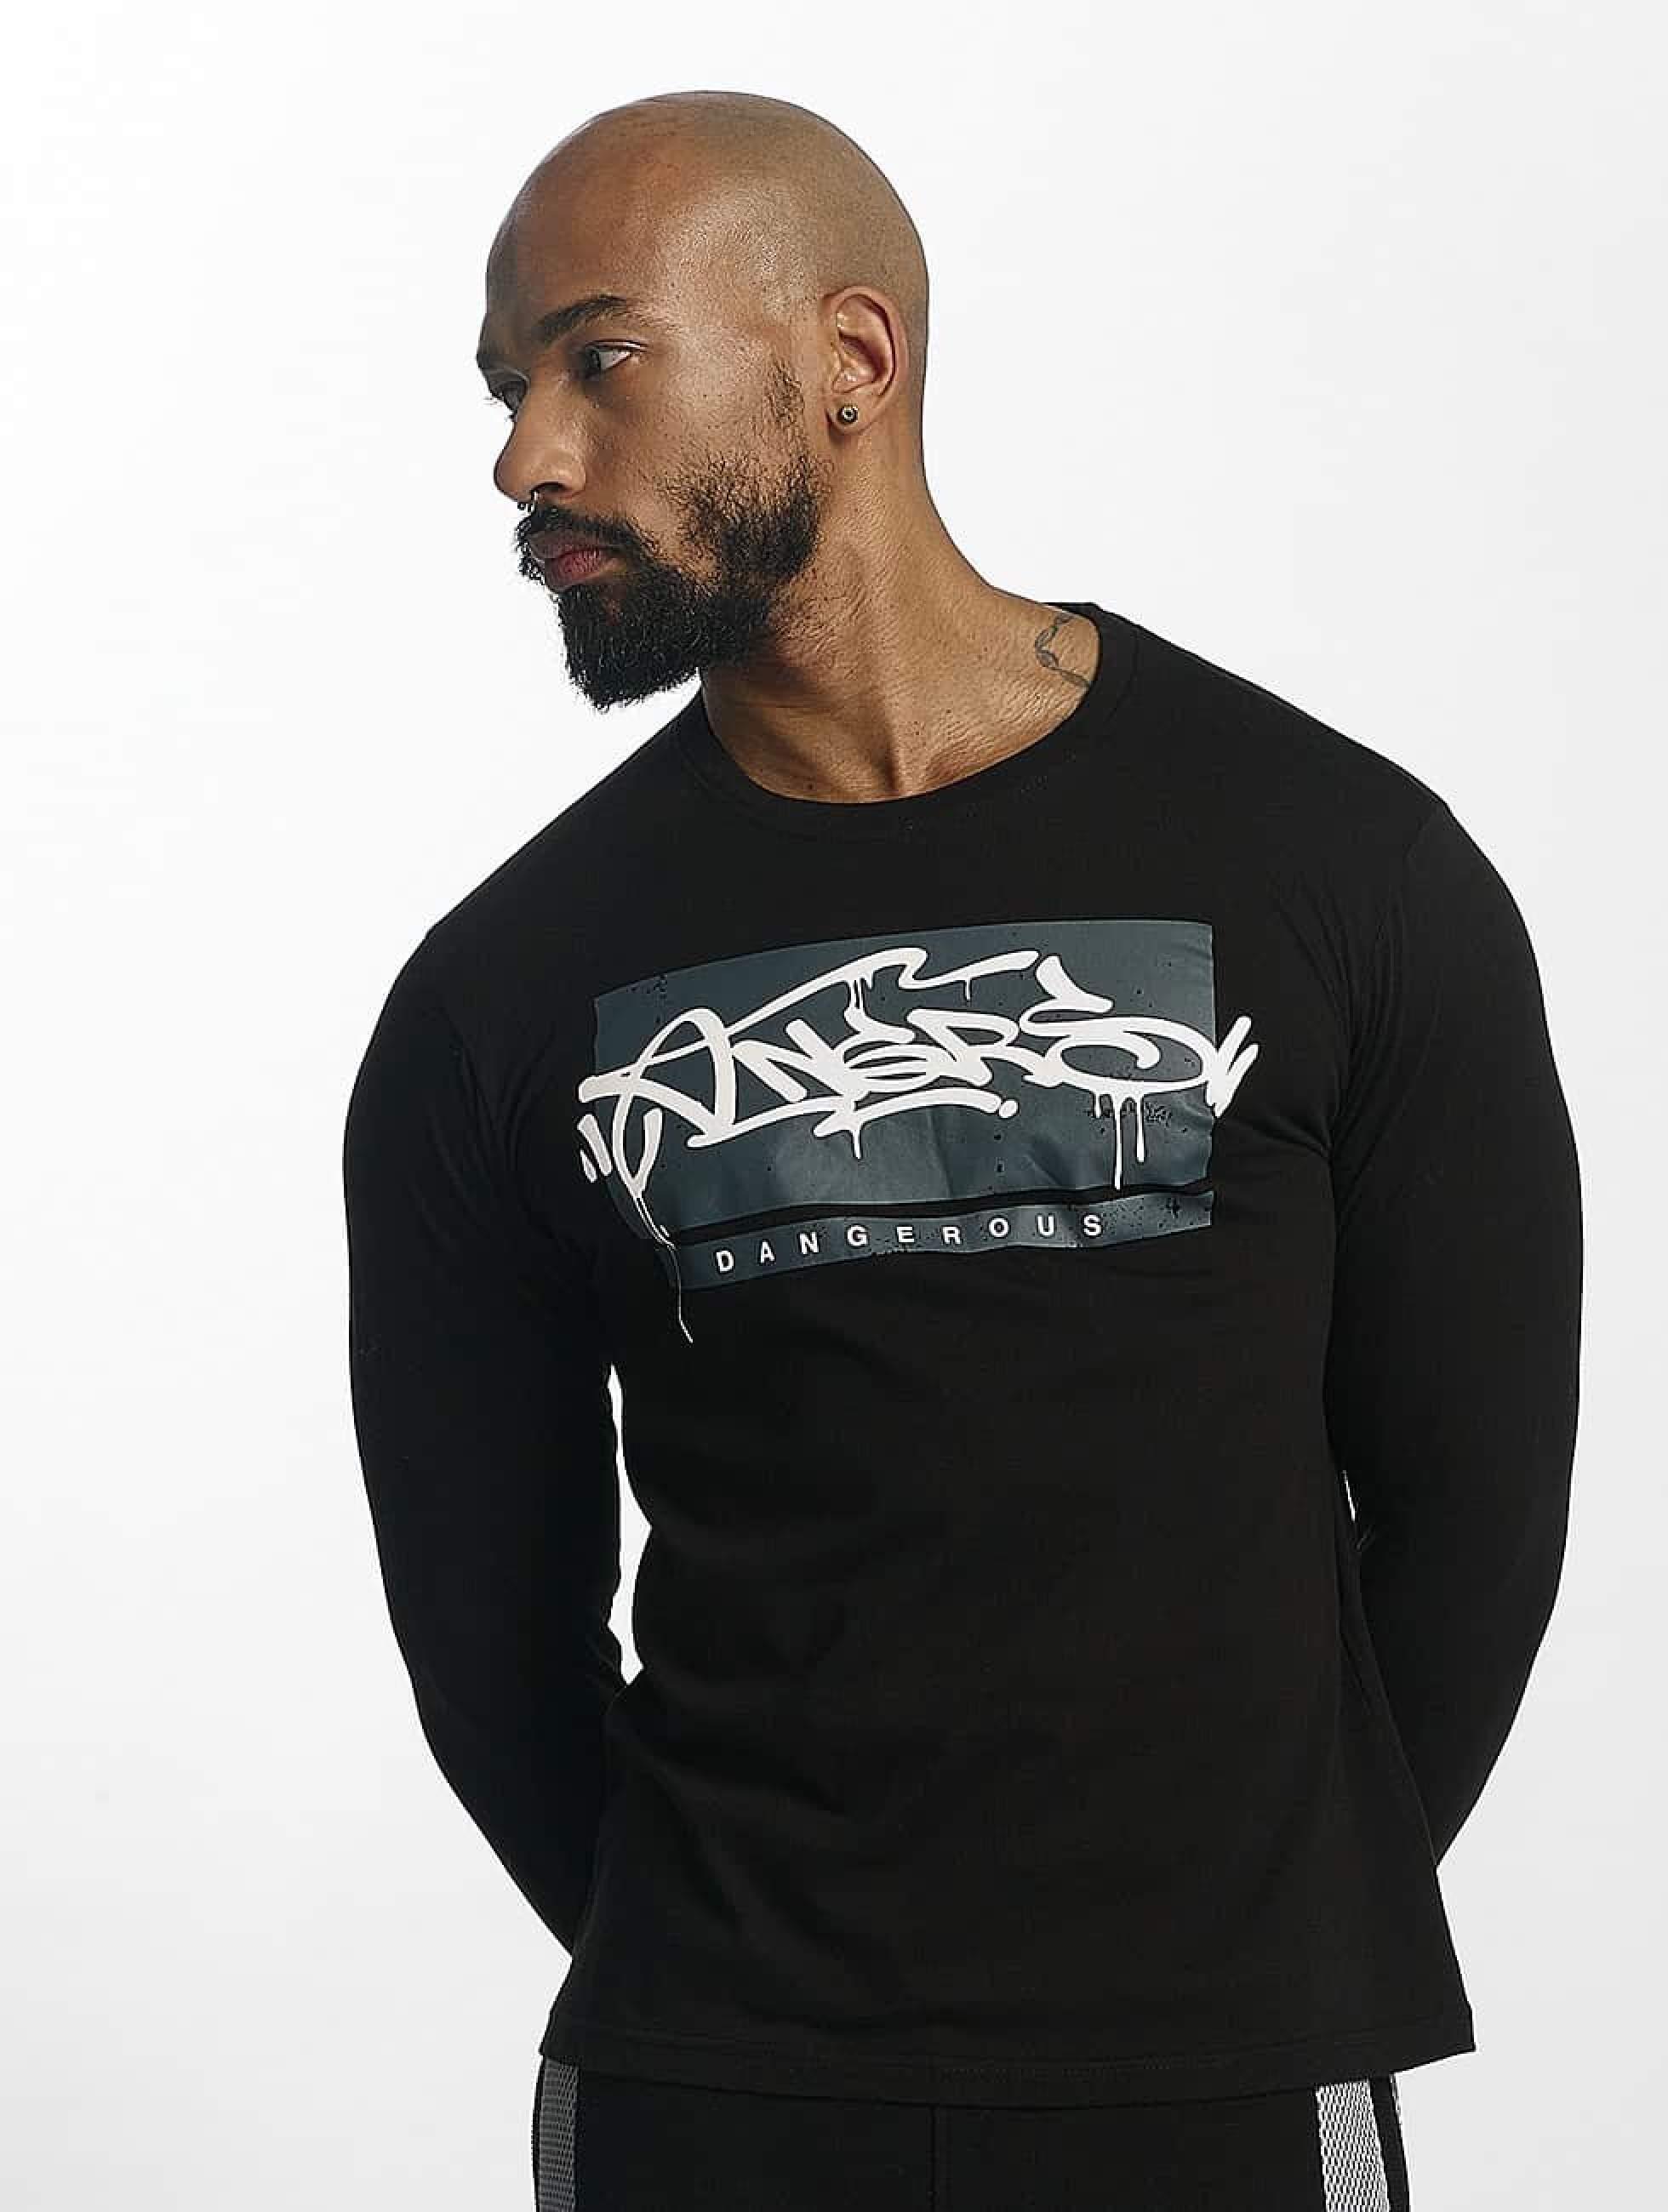 Dangerous DNGRS / Longsleeve Topping in black XL